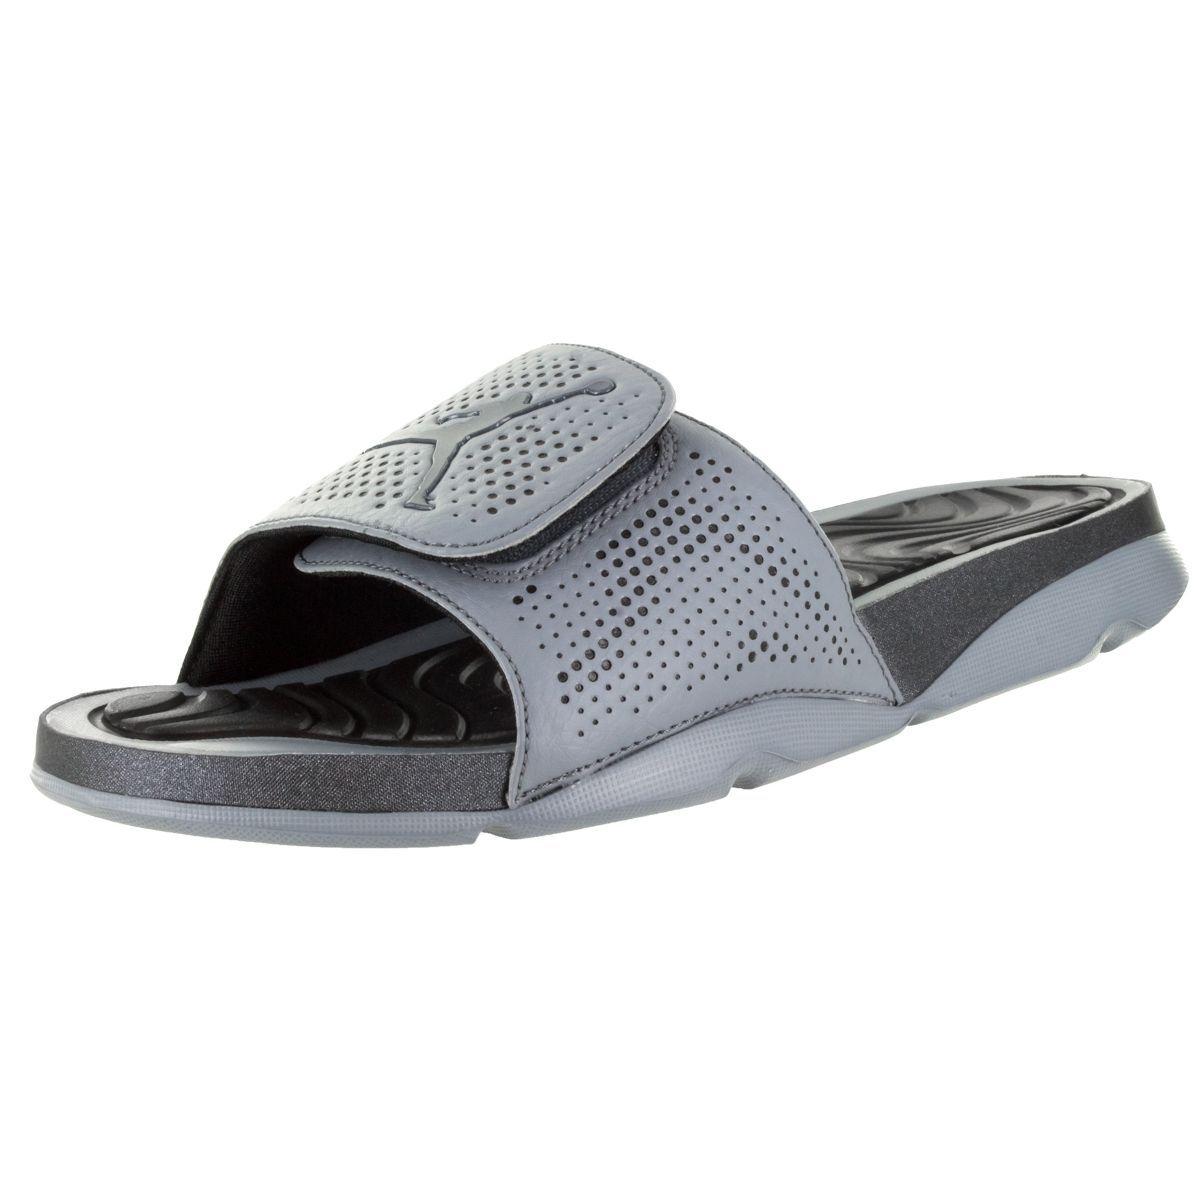 3d8c08f5a81f0 Nike Jordan Men s Jordan Hydro 5 Cool Grey  Hematite Black Sandal ...